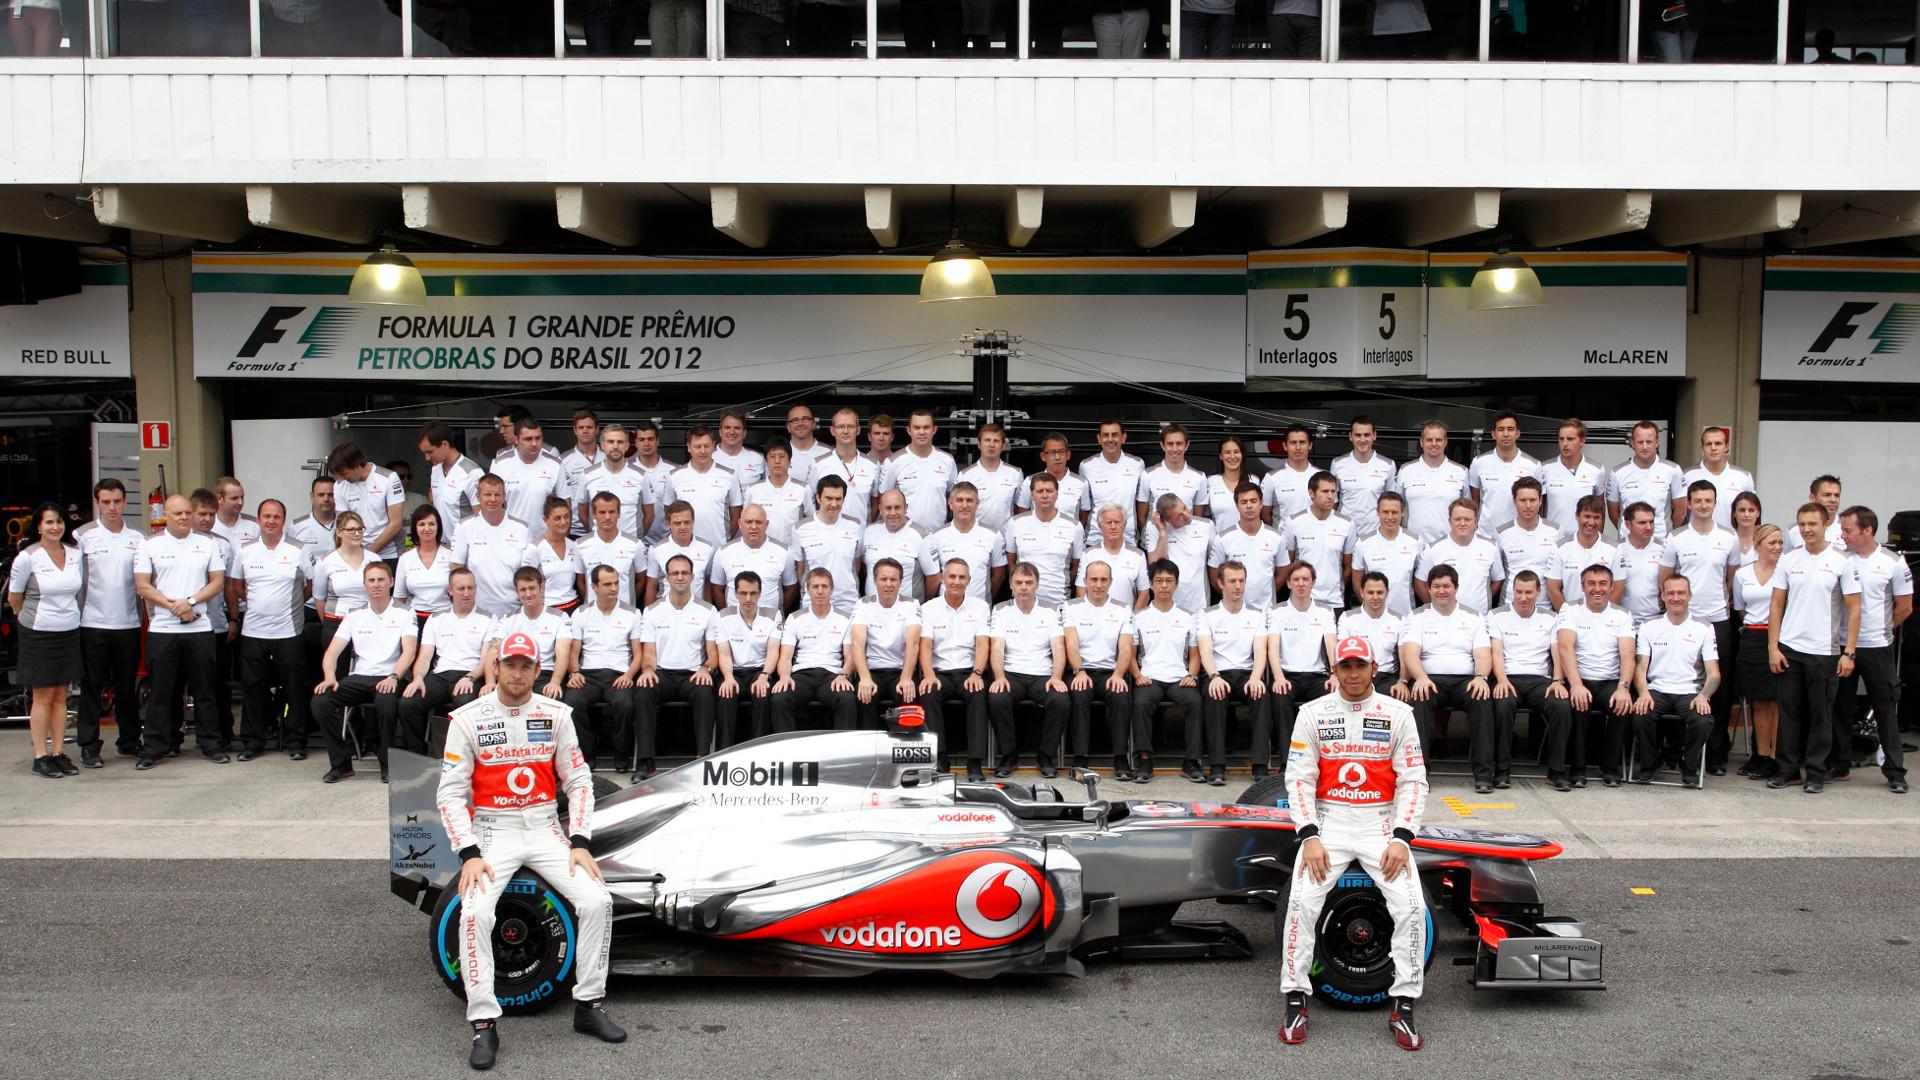 HD Wallpapers 2012 Formula 1 Grand Prix of zil | F1-Fansite.com